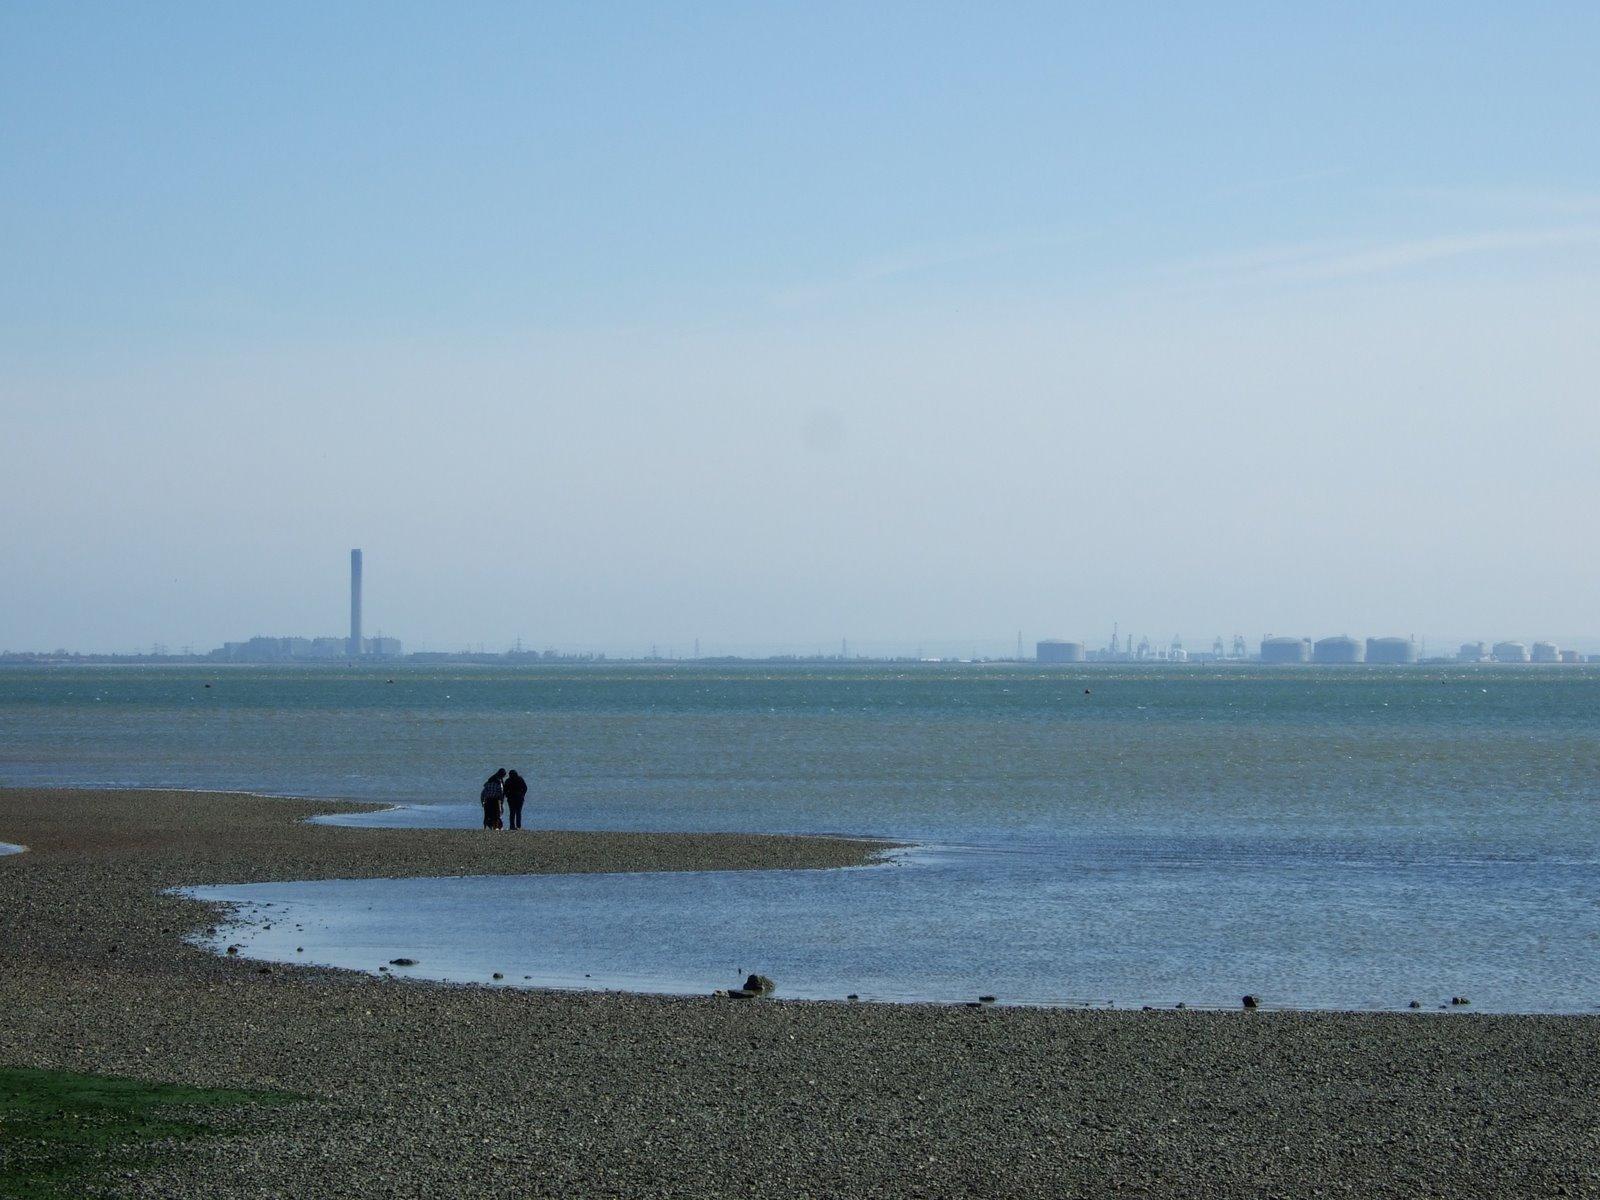 Best Dinghy For Estuary Use